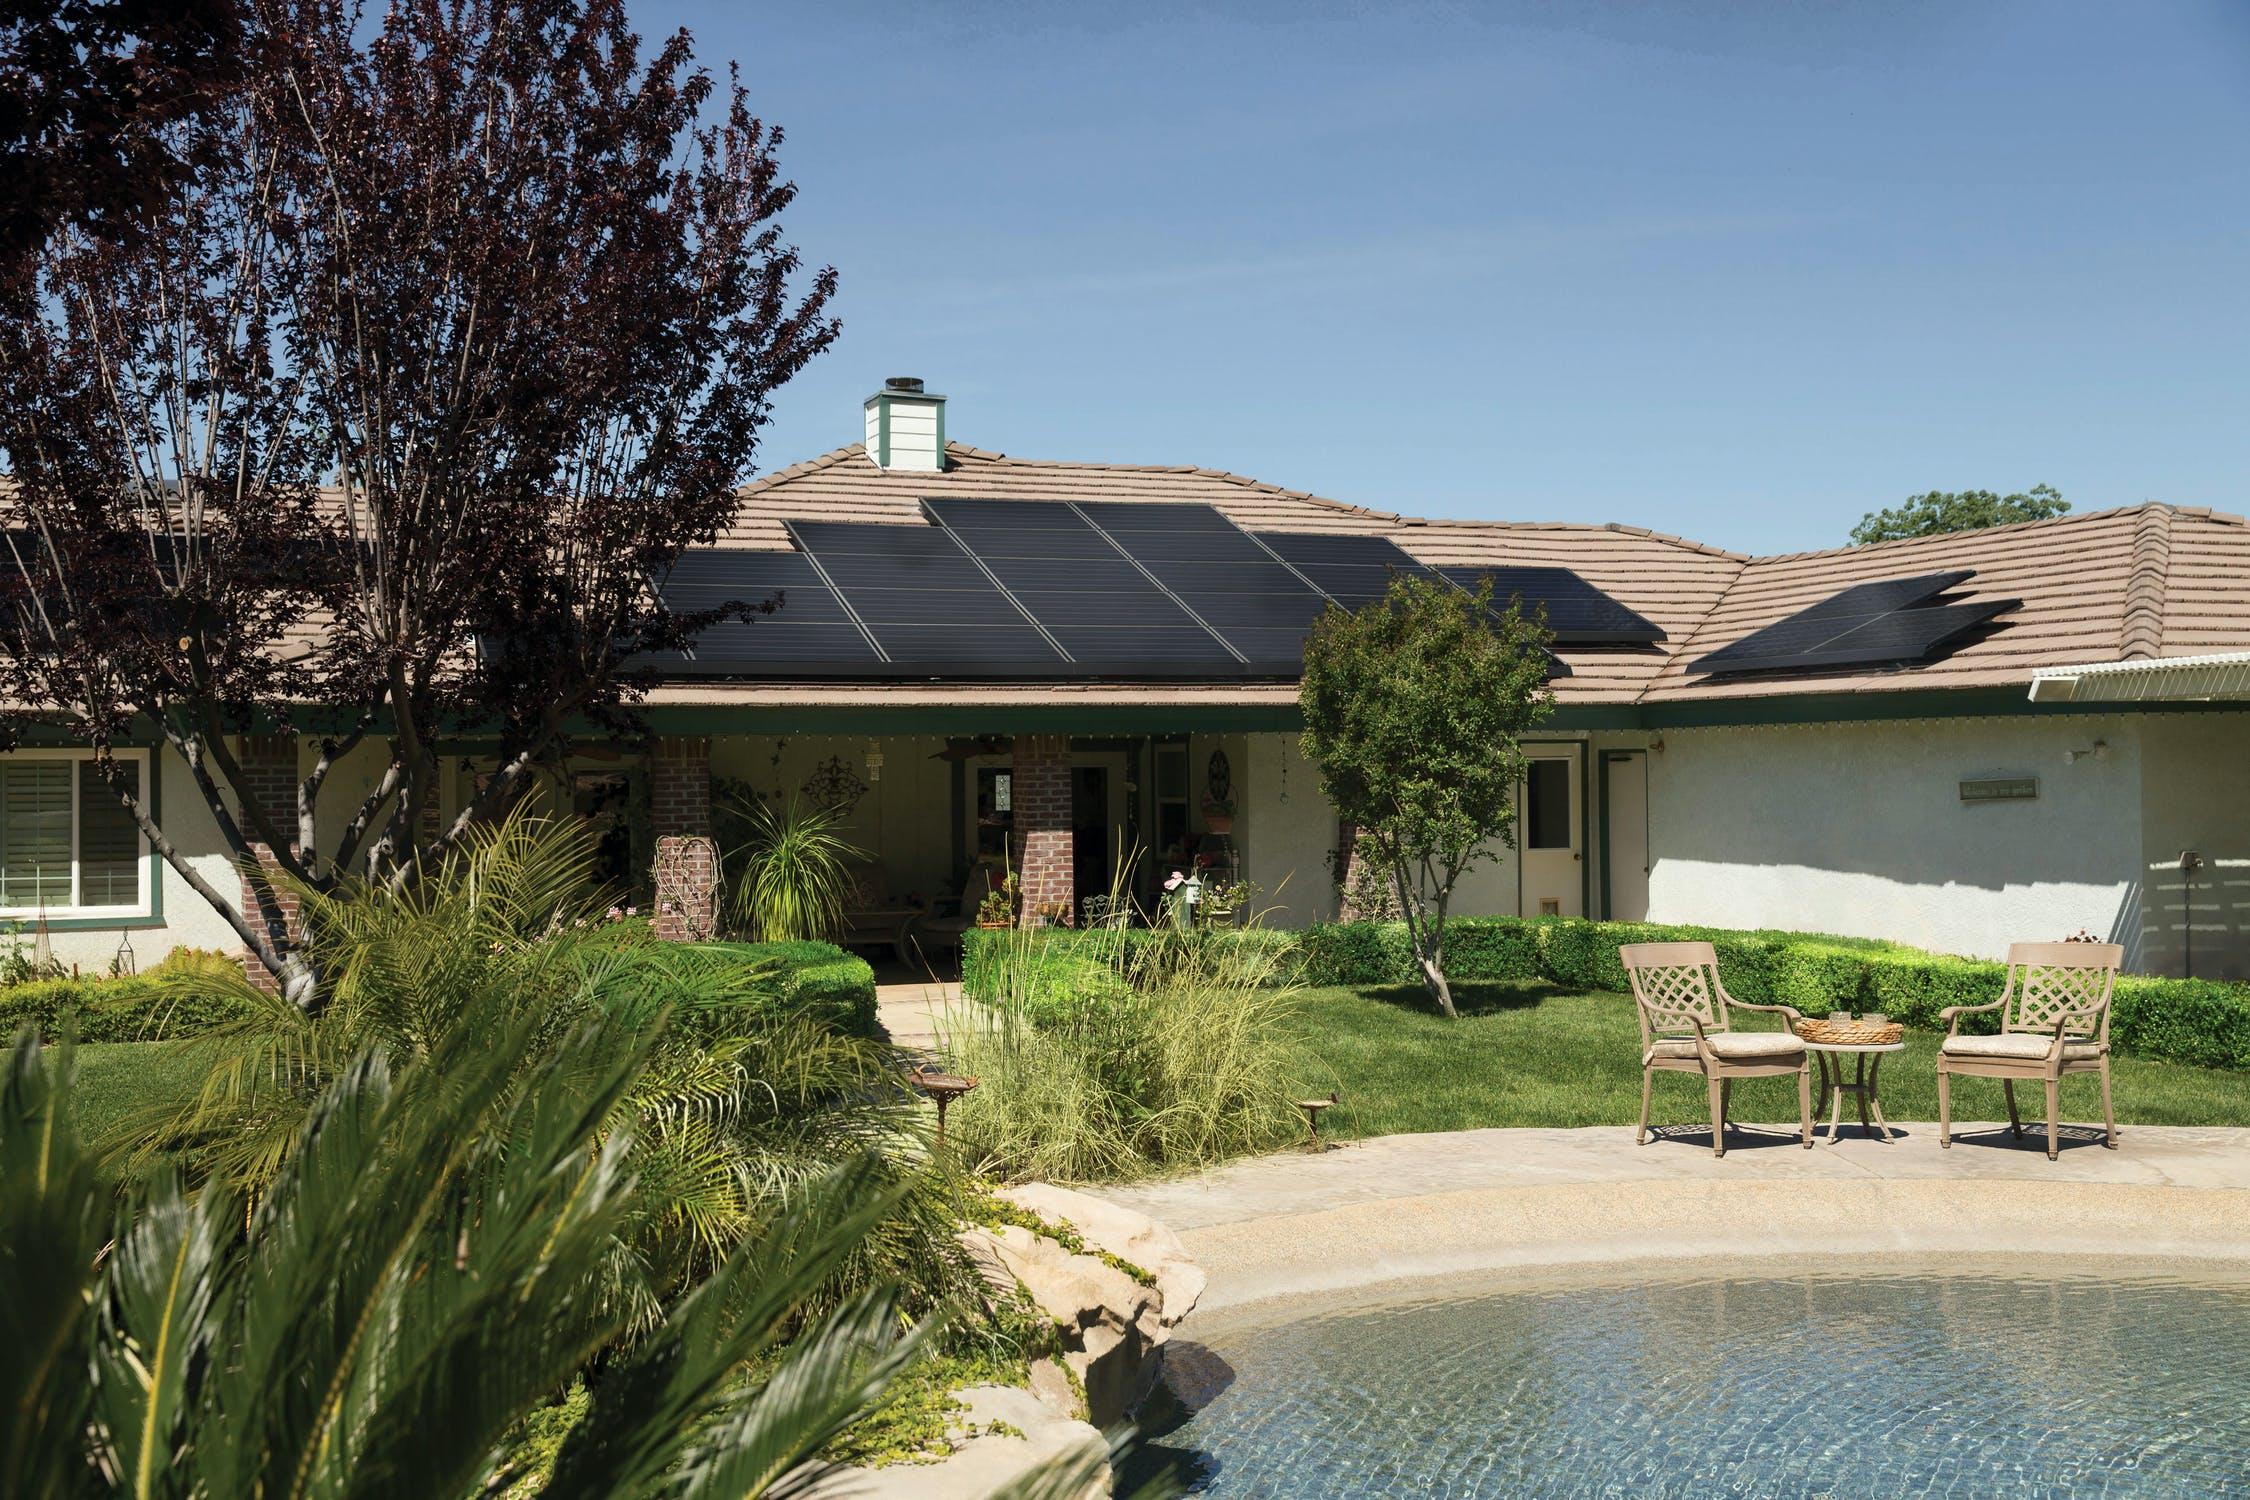 do solar panels raise the value of the house